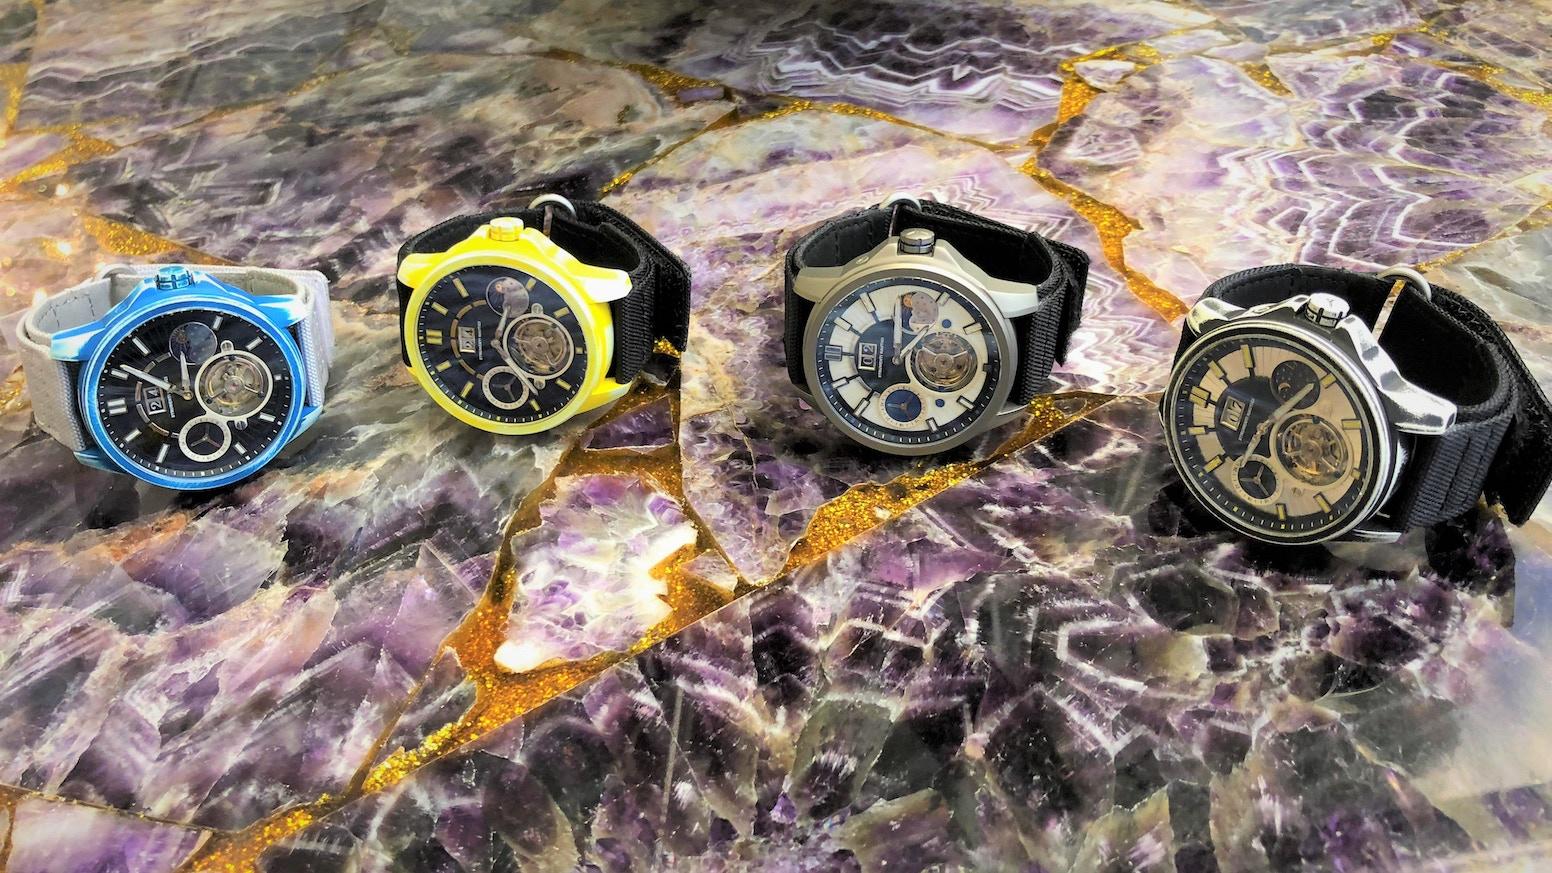 Cerakote Titanium Automatic Tourbillon watch water resistant to 200 meters.